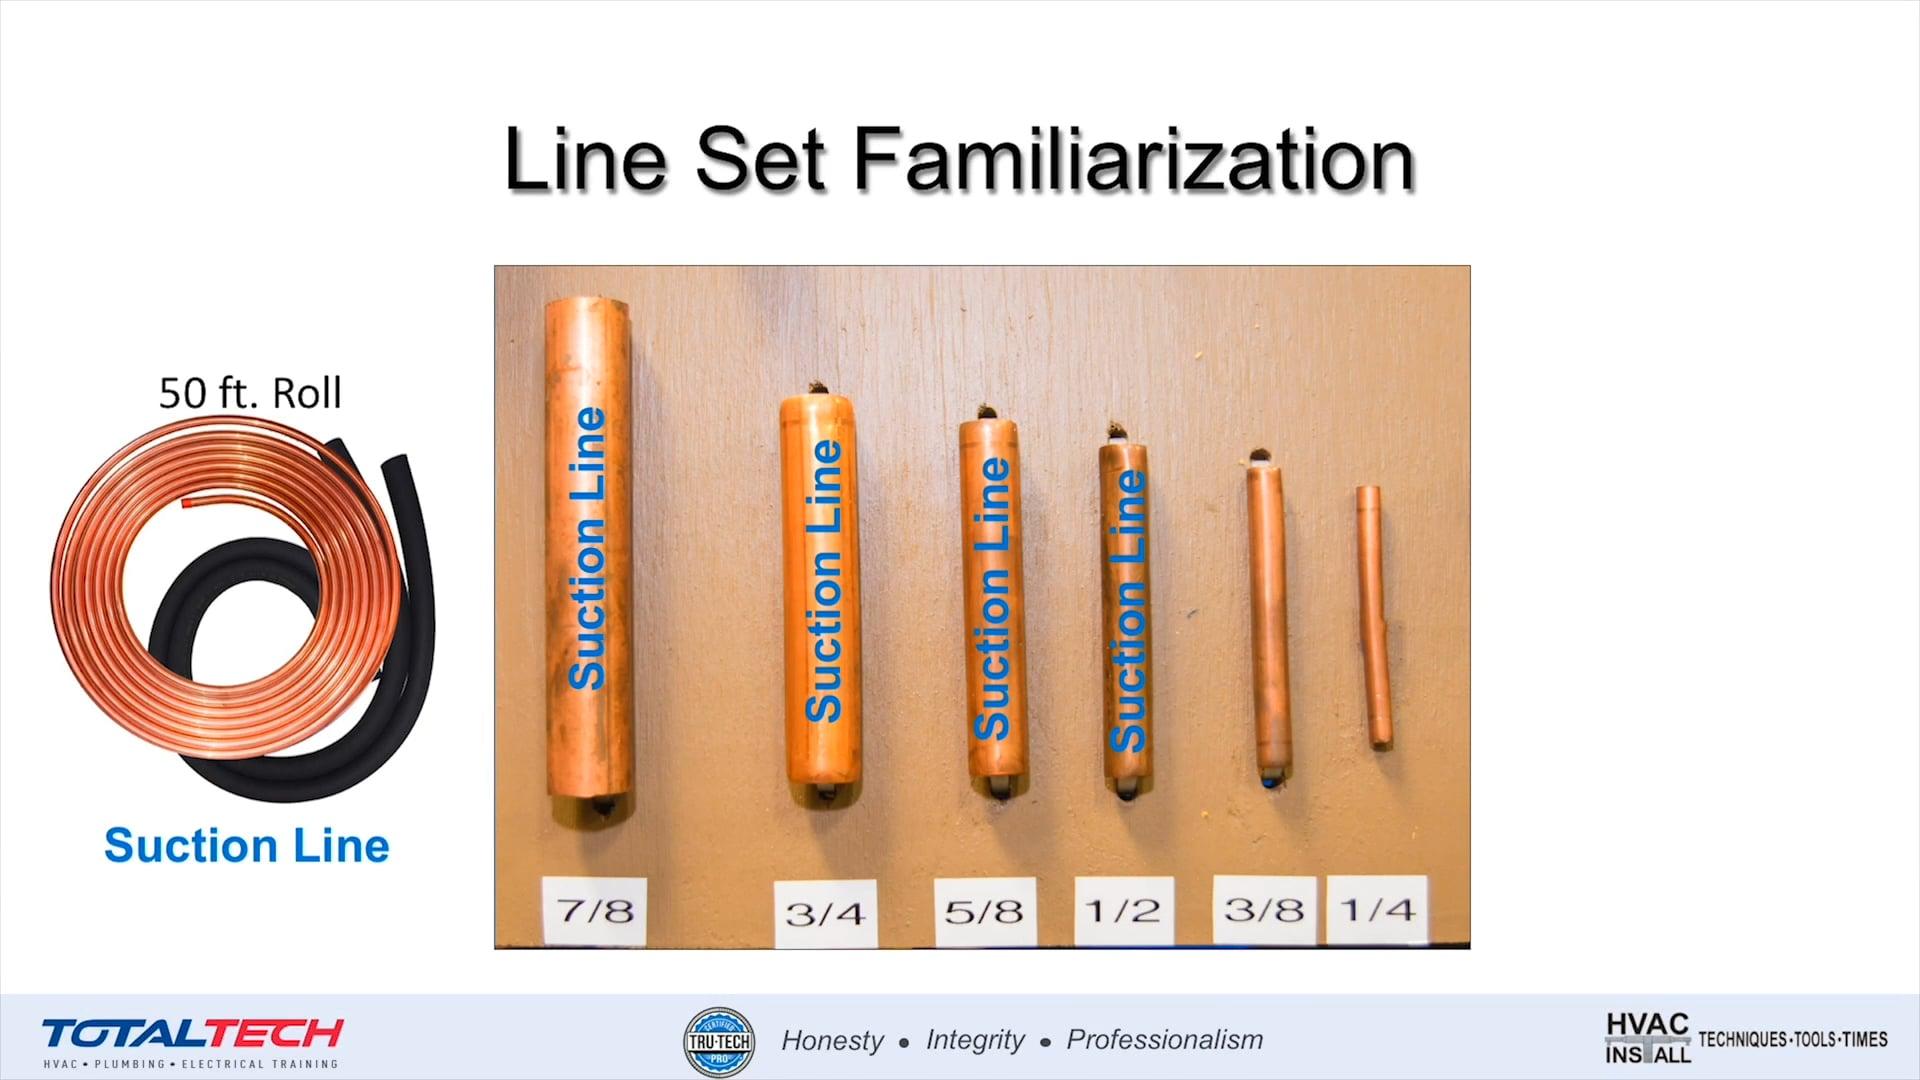 Installation-Suction Line Performance